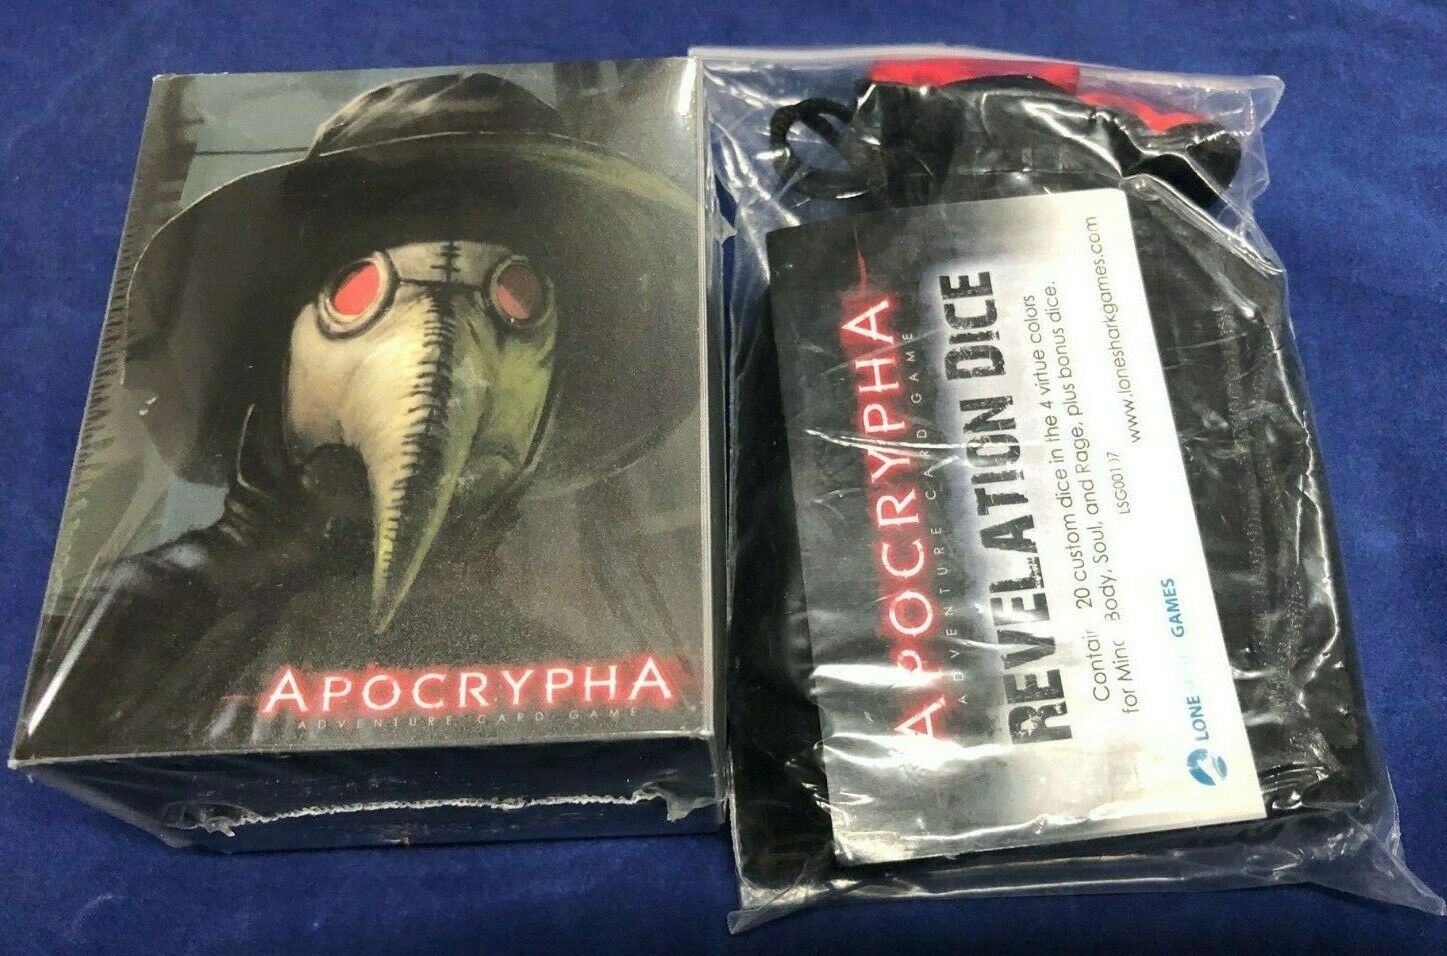 apocrypha adventure card game deck box